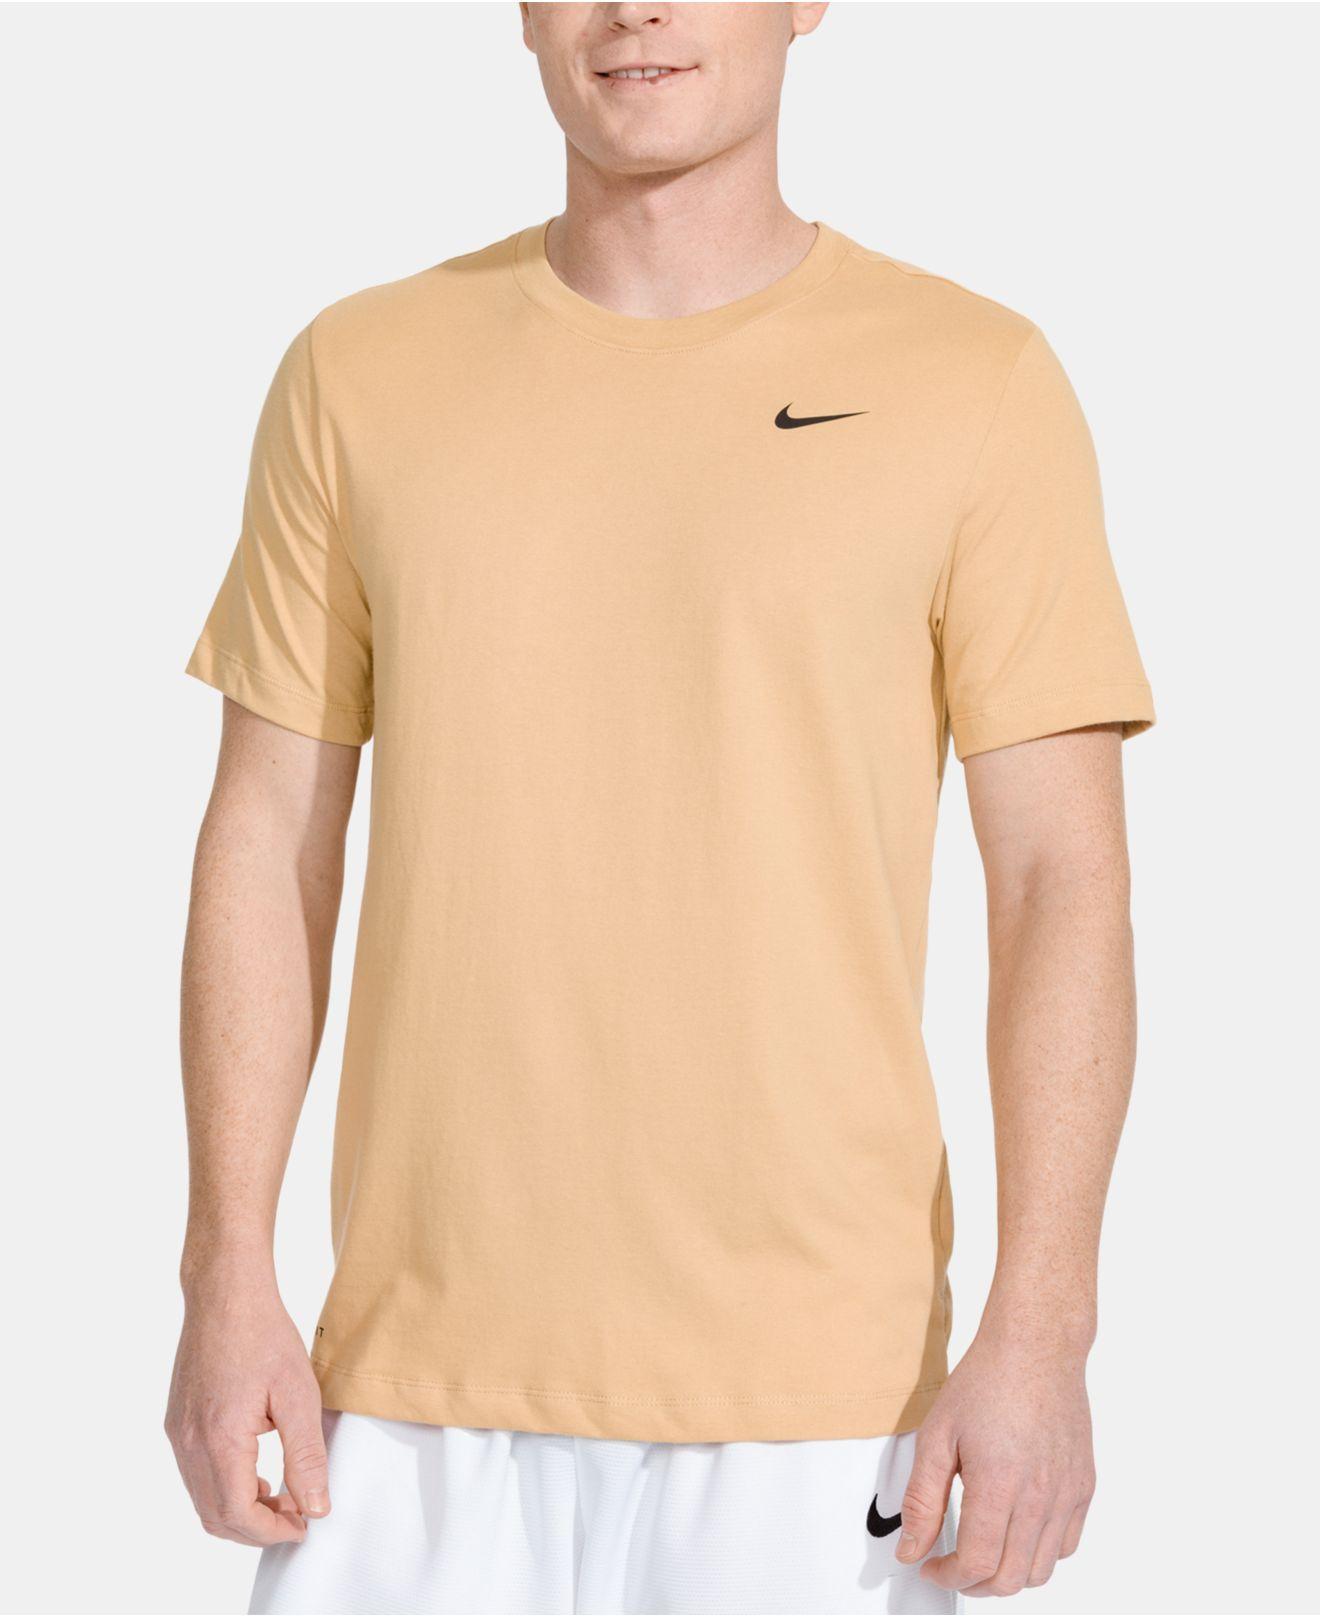 a7315cd48a Lyst - Nike Dri-fit Training T-shirt for Men